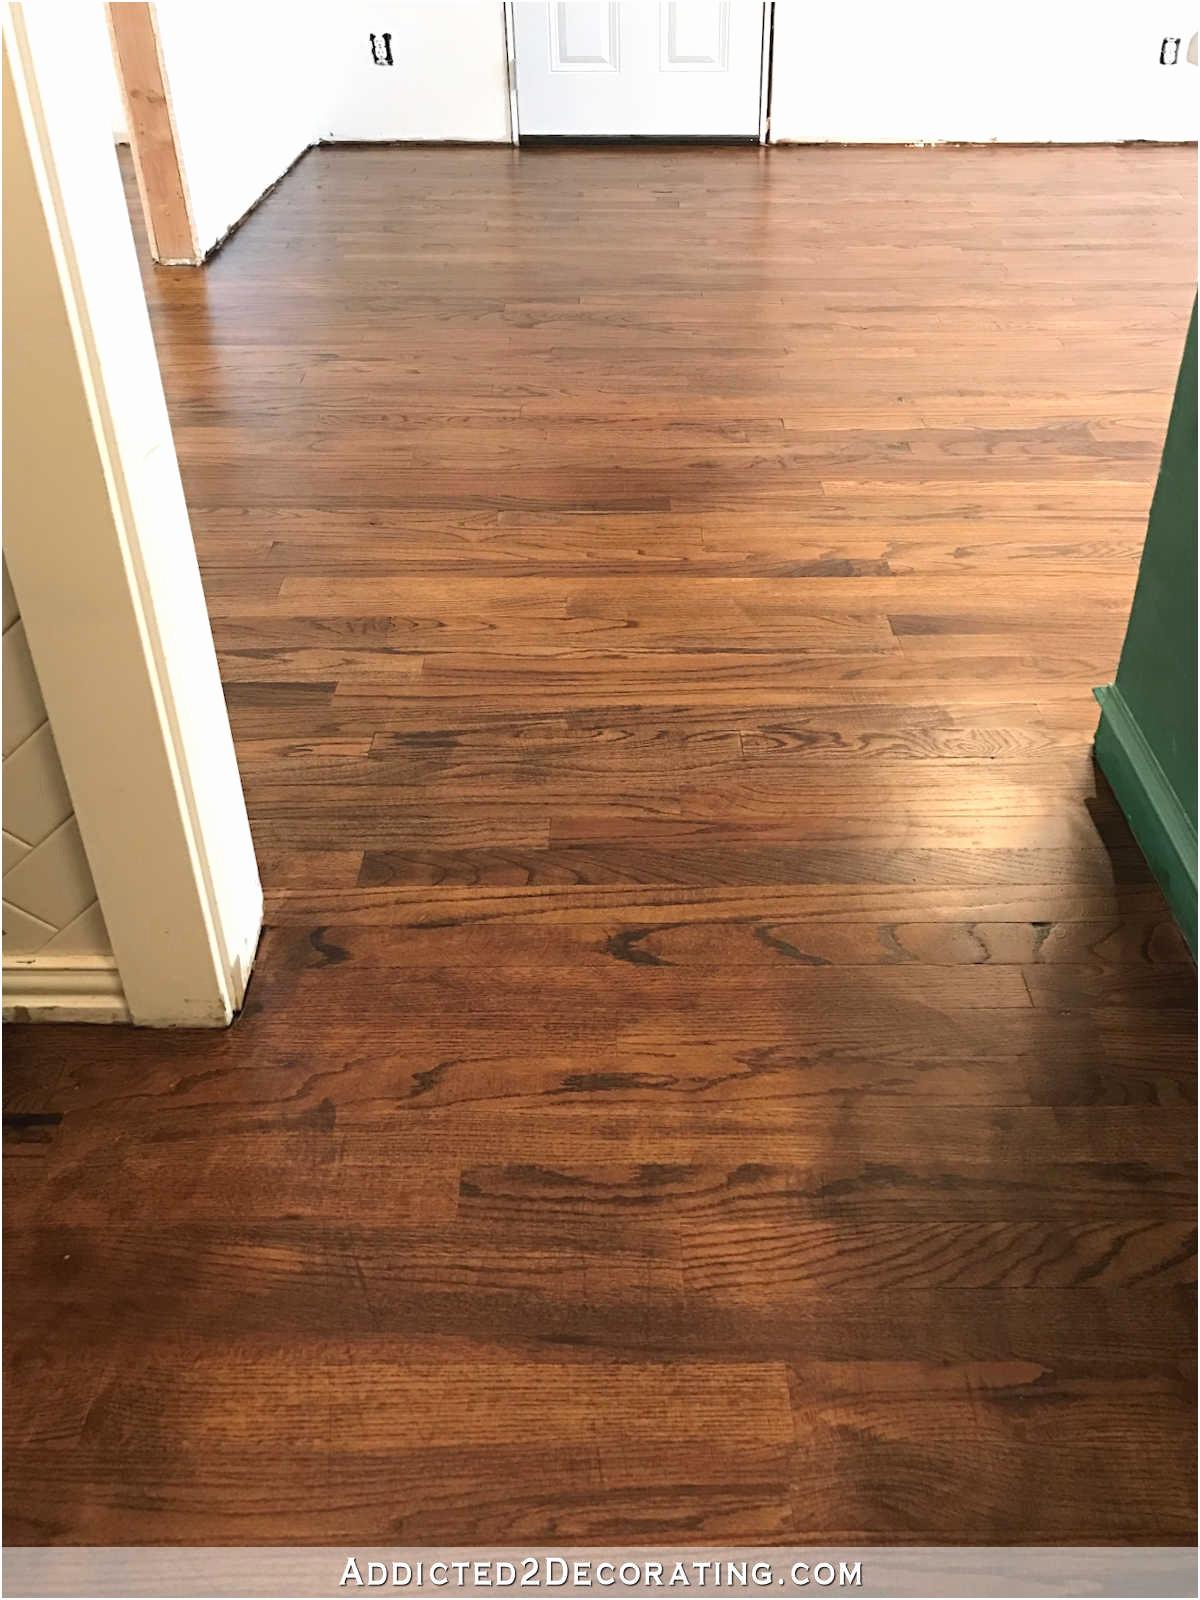 hardwood flooring tips of hardwood in kitchen vs tile inspirational kitchen design pics new with regard to hardwood in kitchen vs tile luxury 50 beautiful hardwood floor estimate 50 s